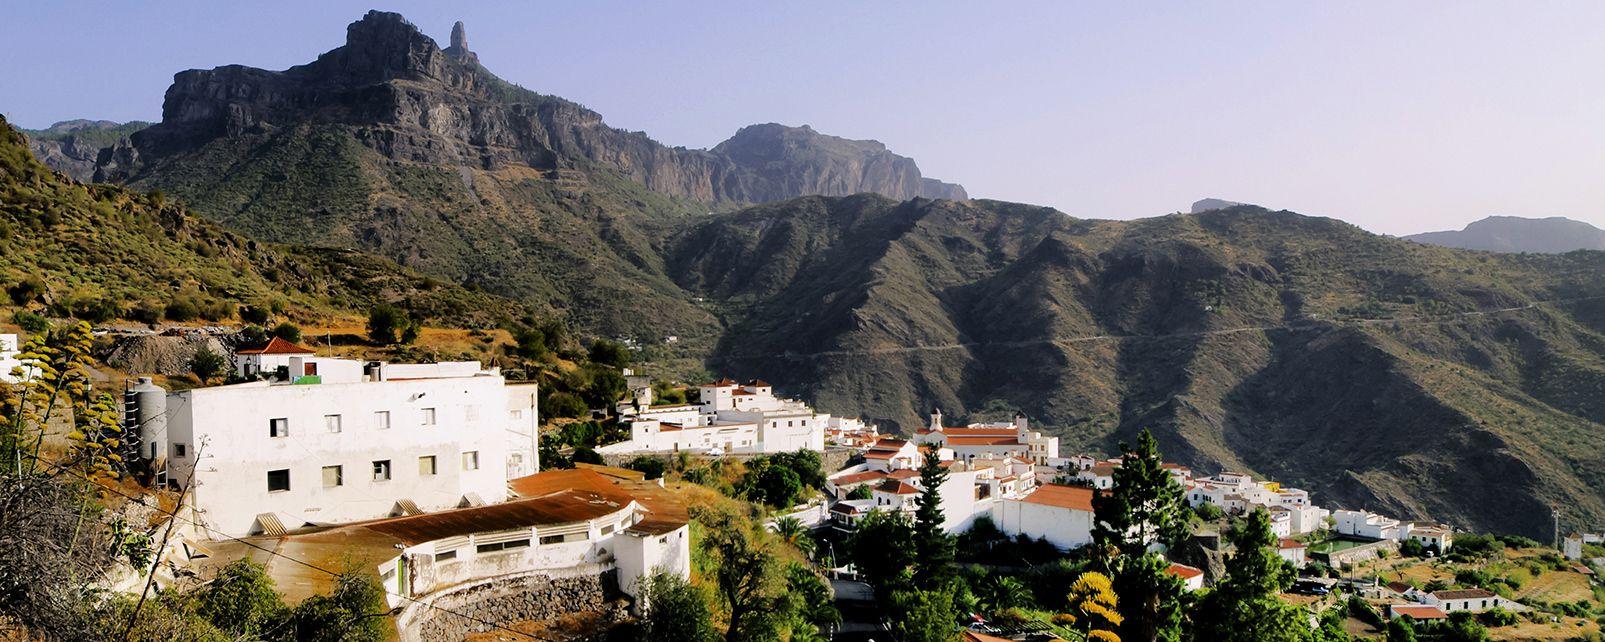 Tejeda, Canaries, Espagne